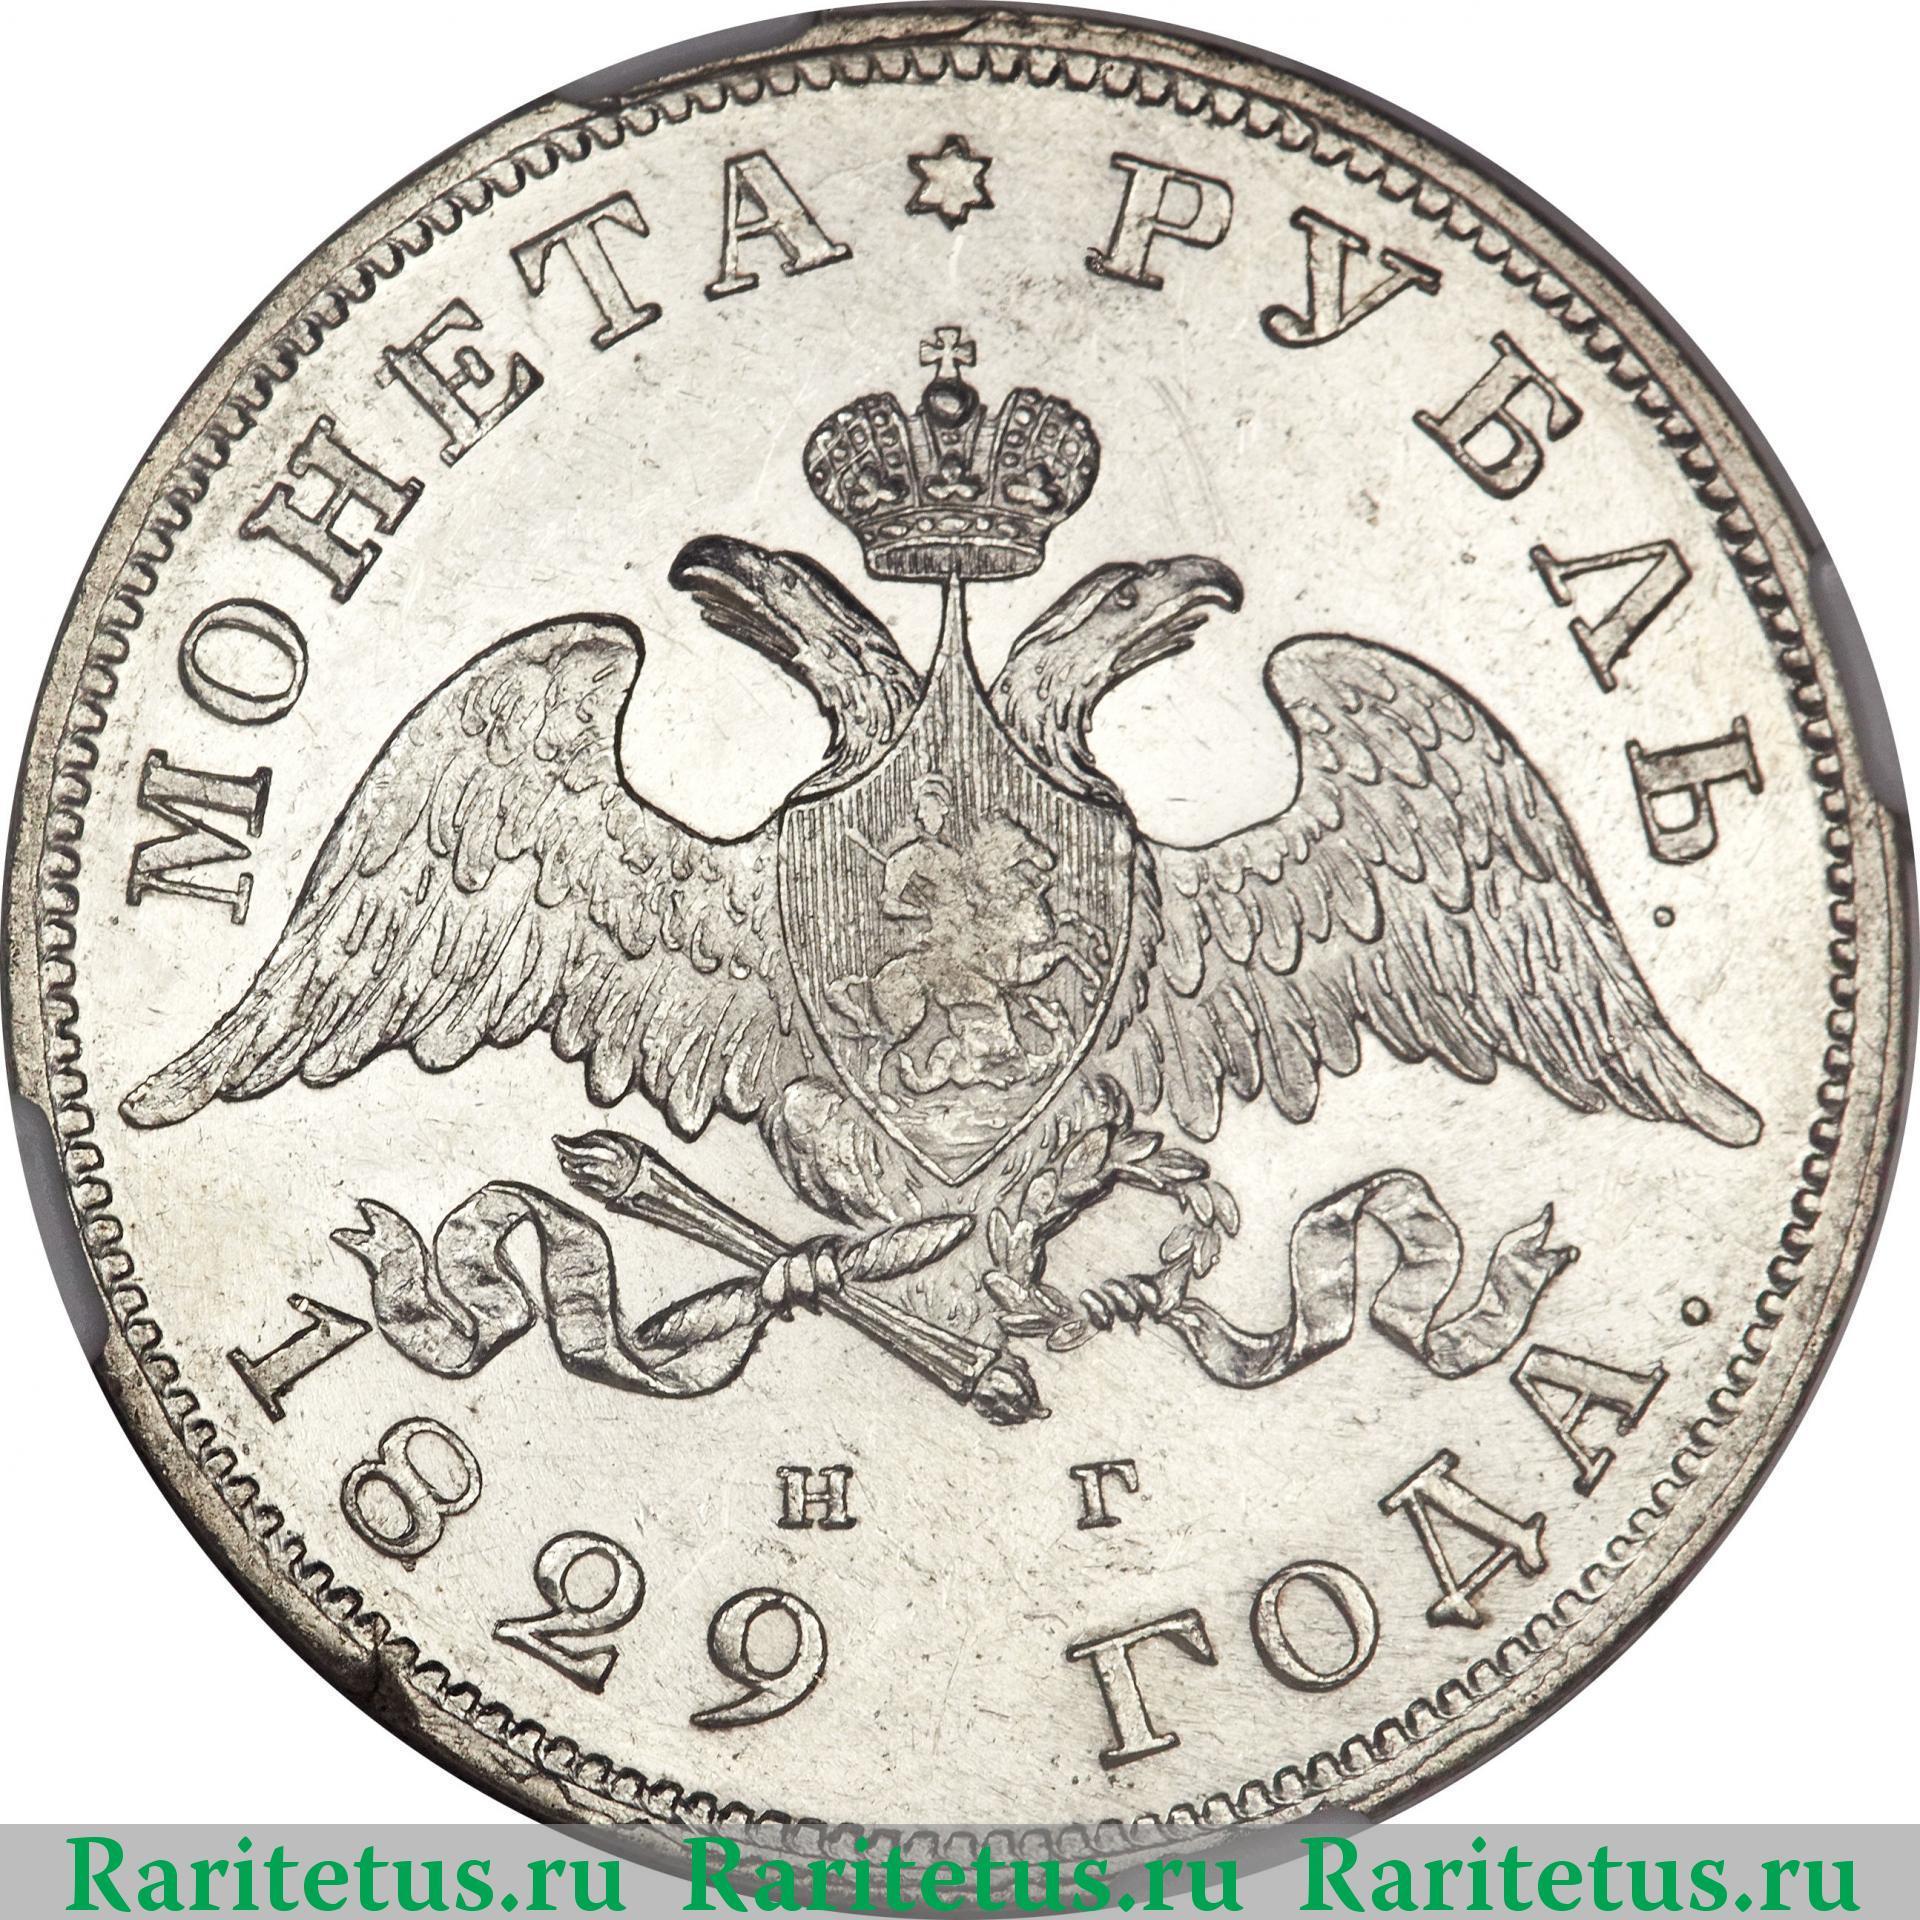 Аверс монеты 1 рубль 1829 года СПБ-НГ